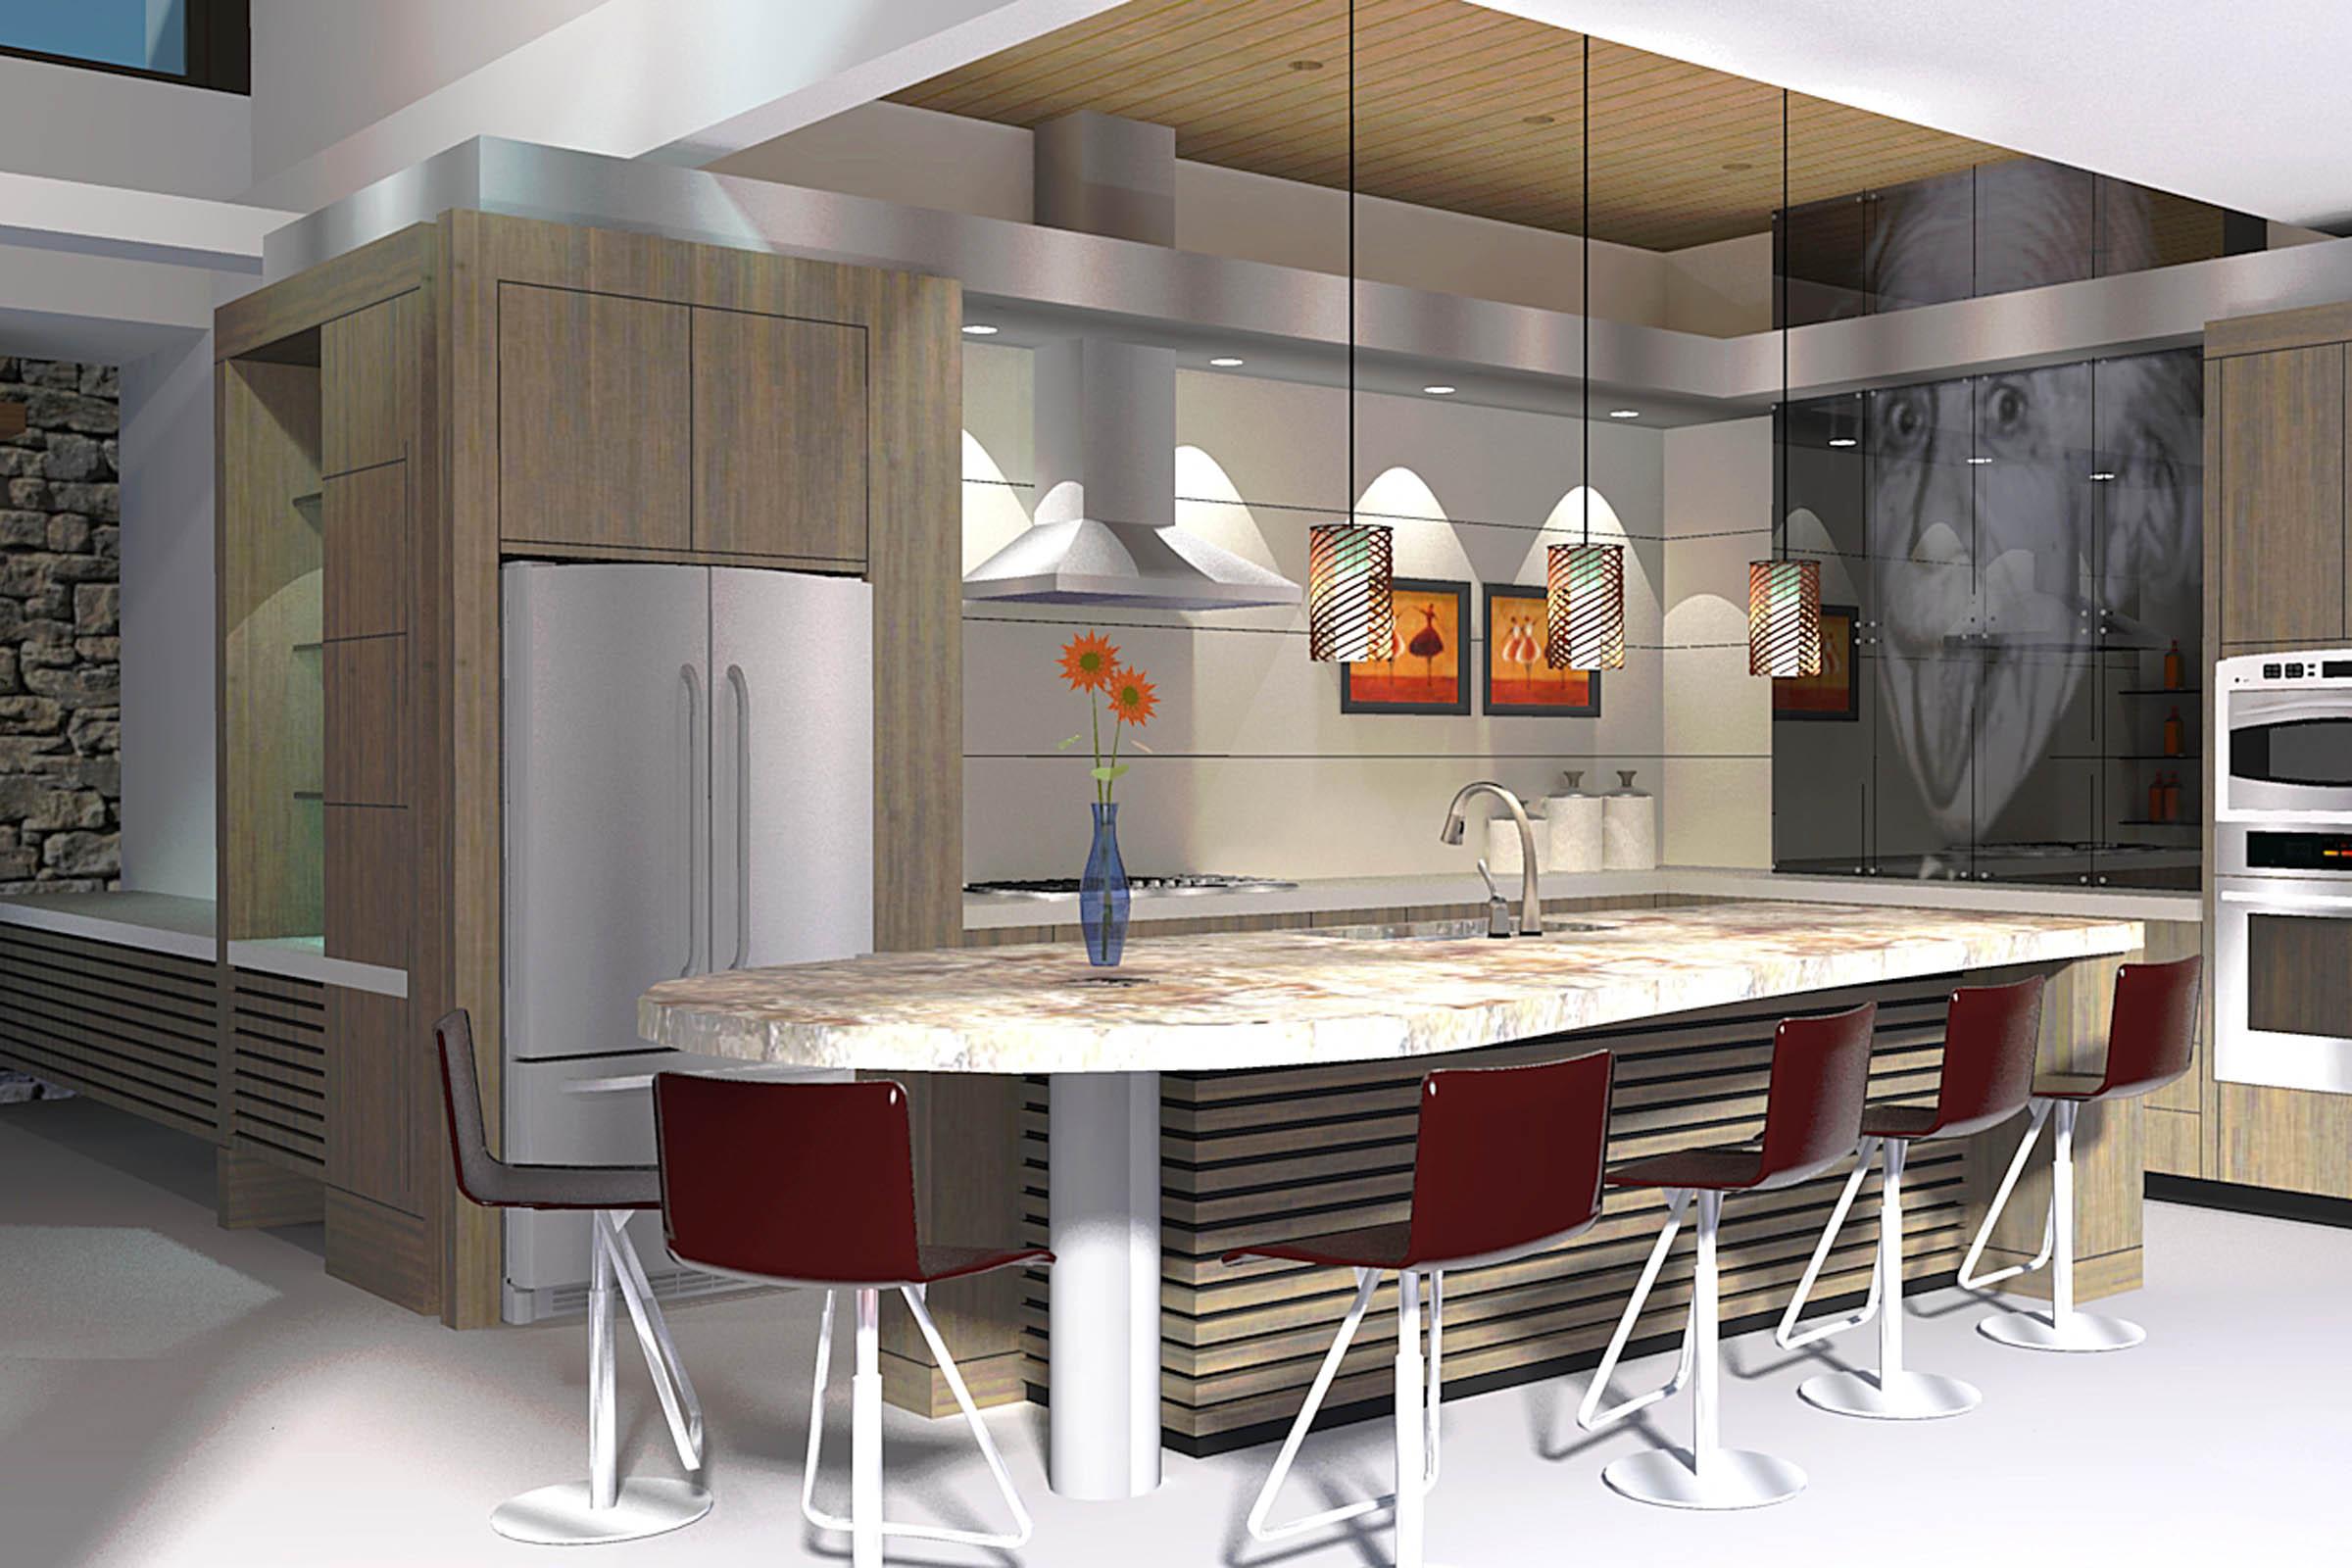 Arteriors Architects Kitchen Design - Computer Model